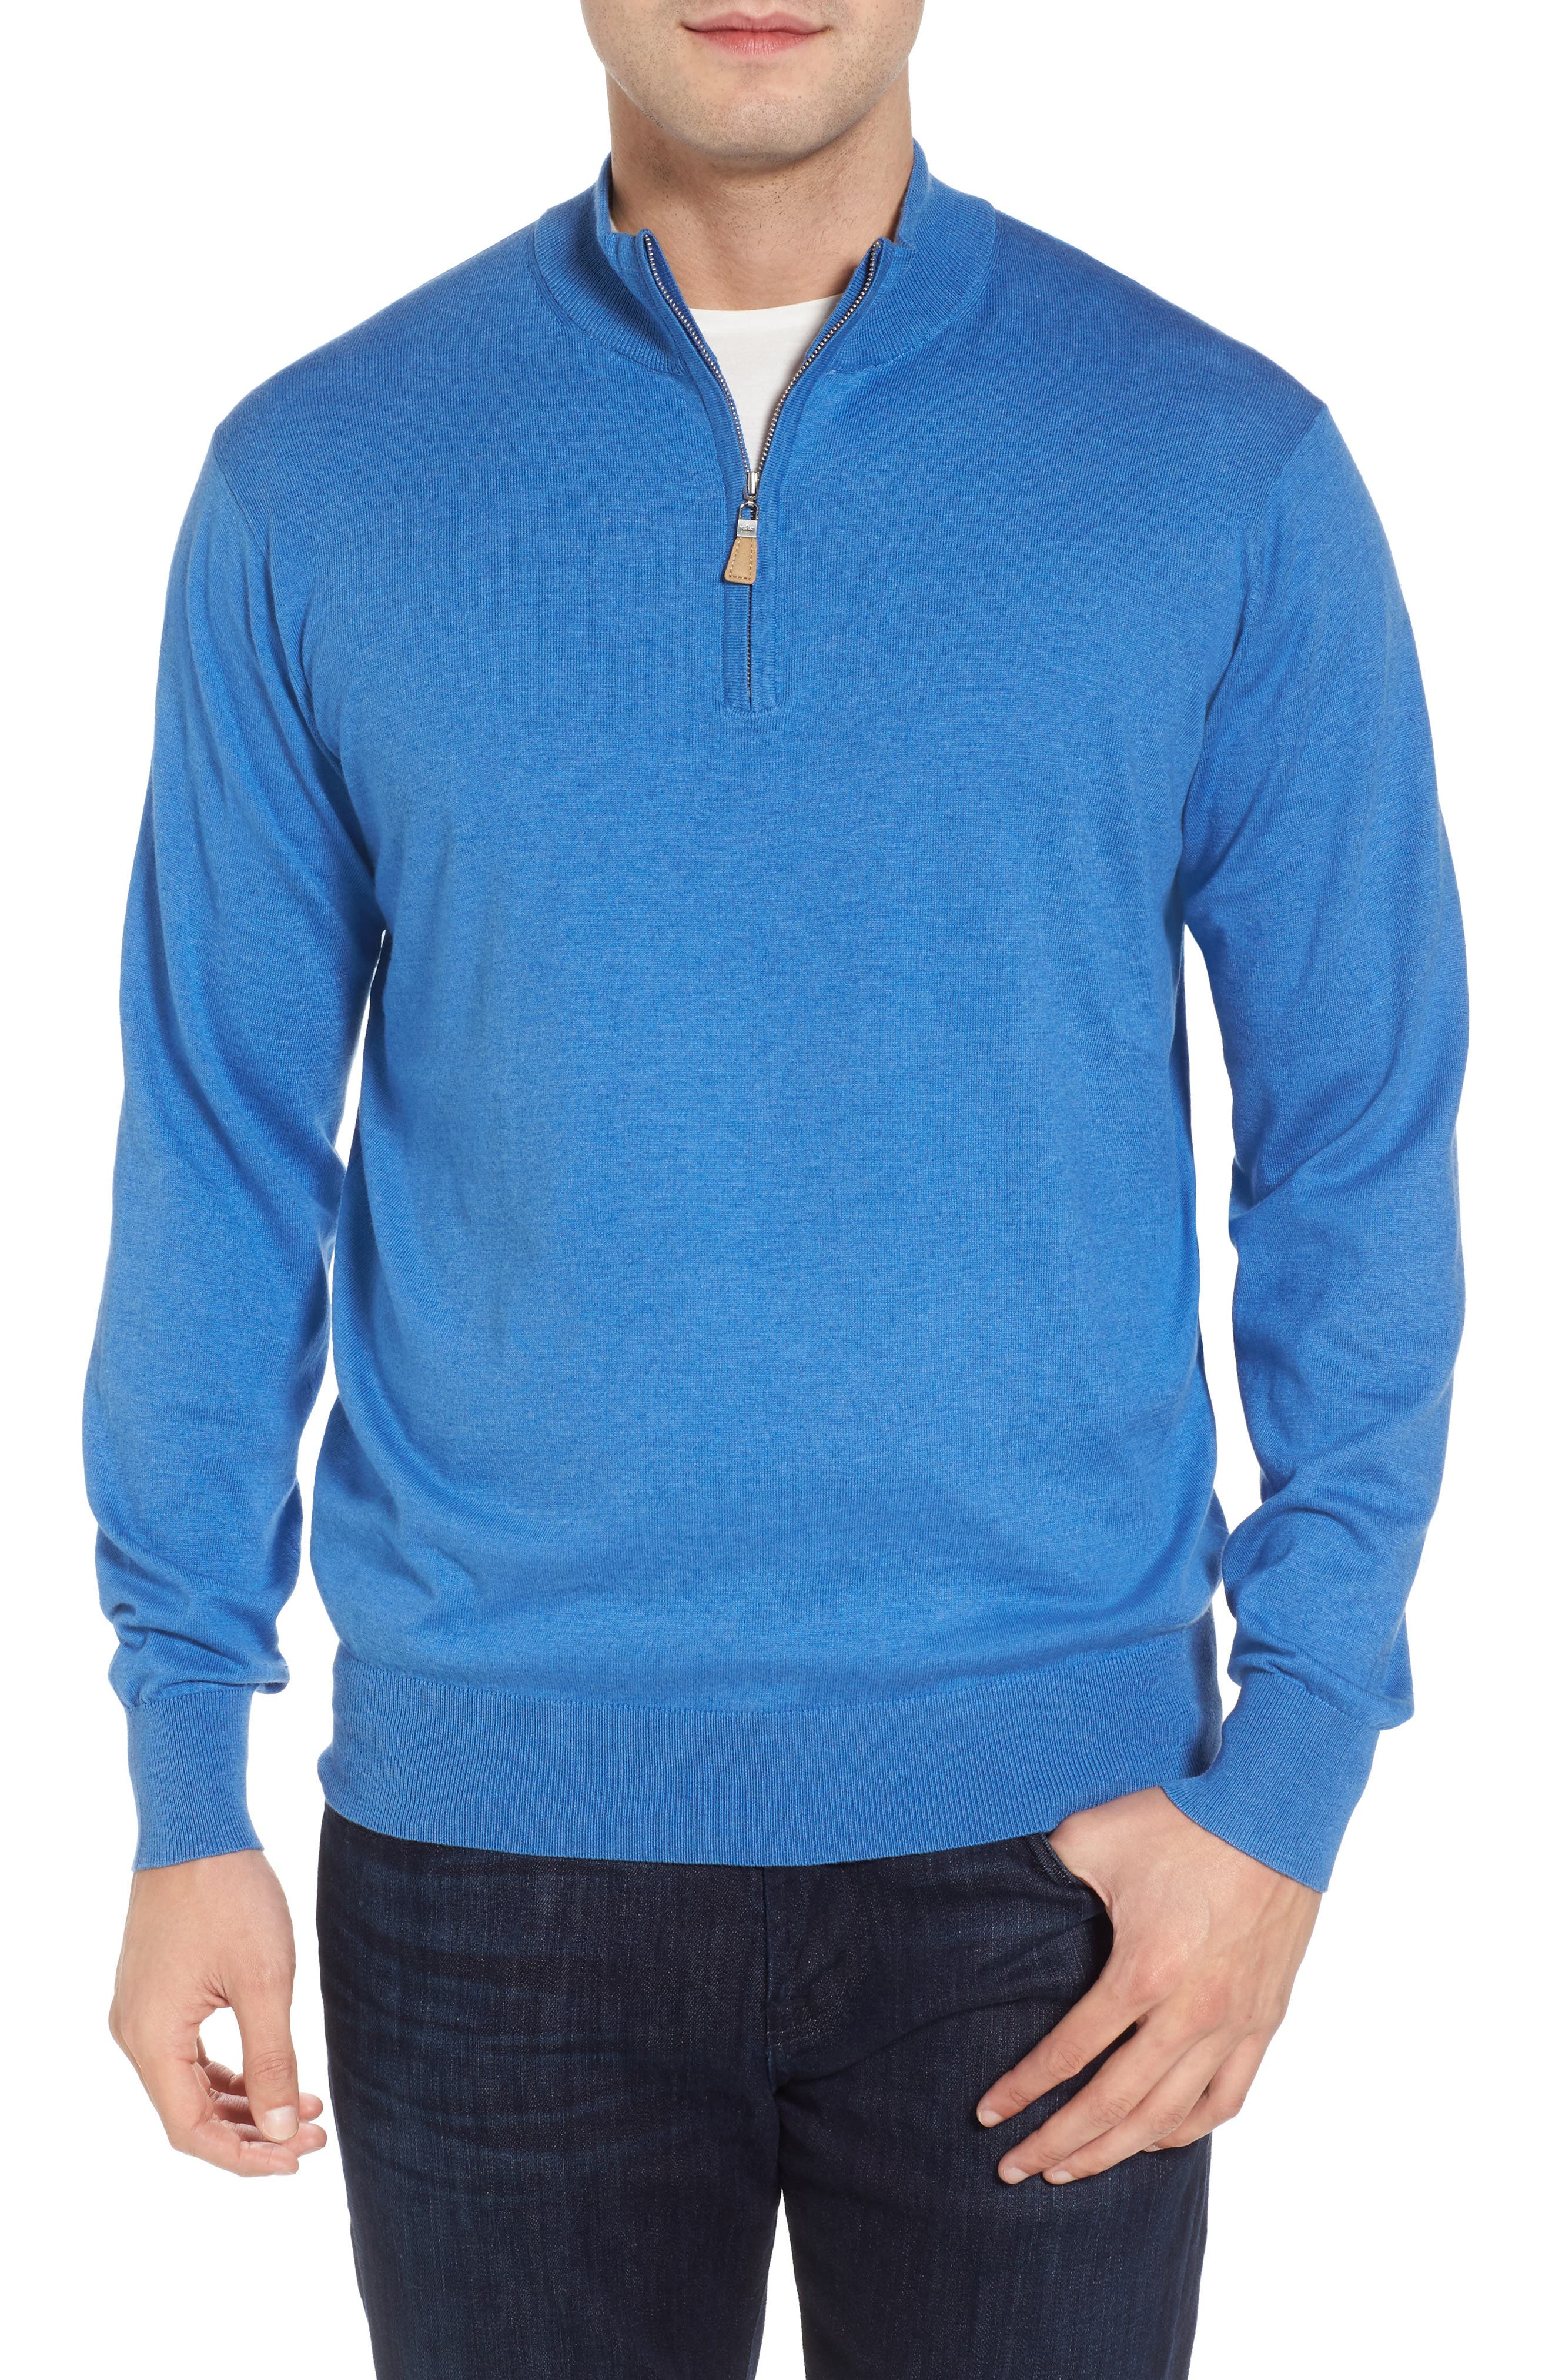 Main Image - Peter Millar Crown Soft Quarter-Zip Pullover